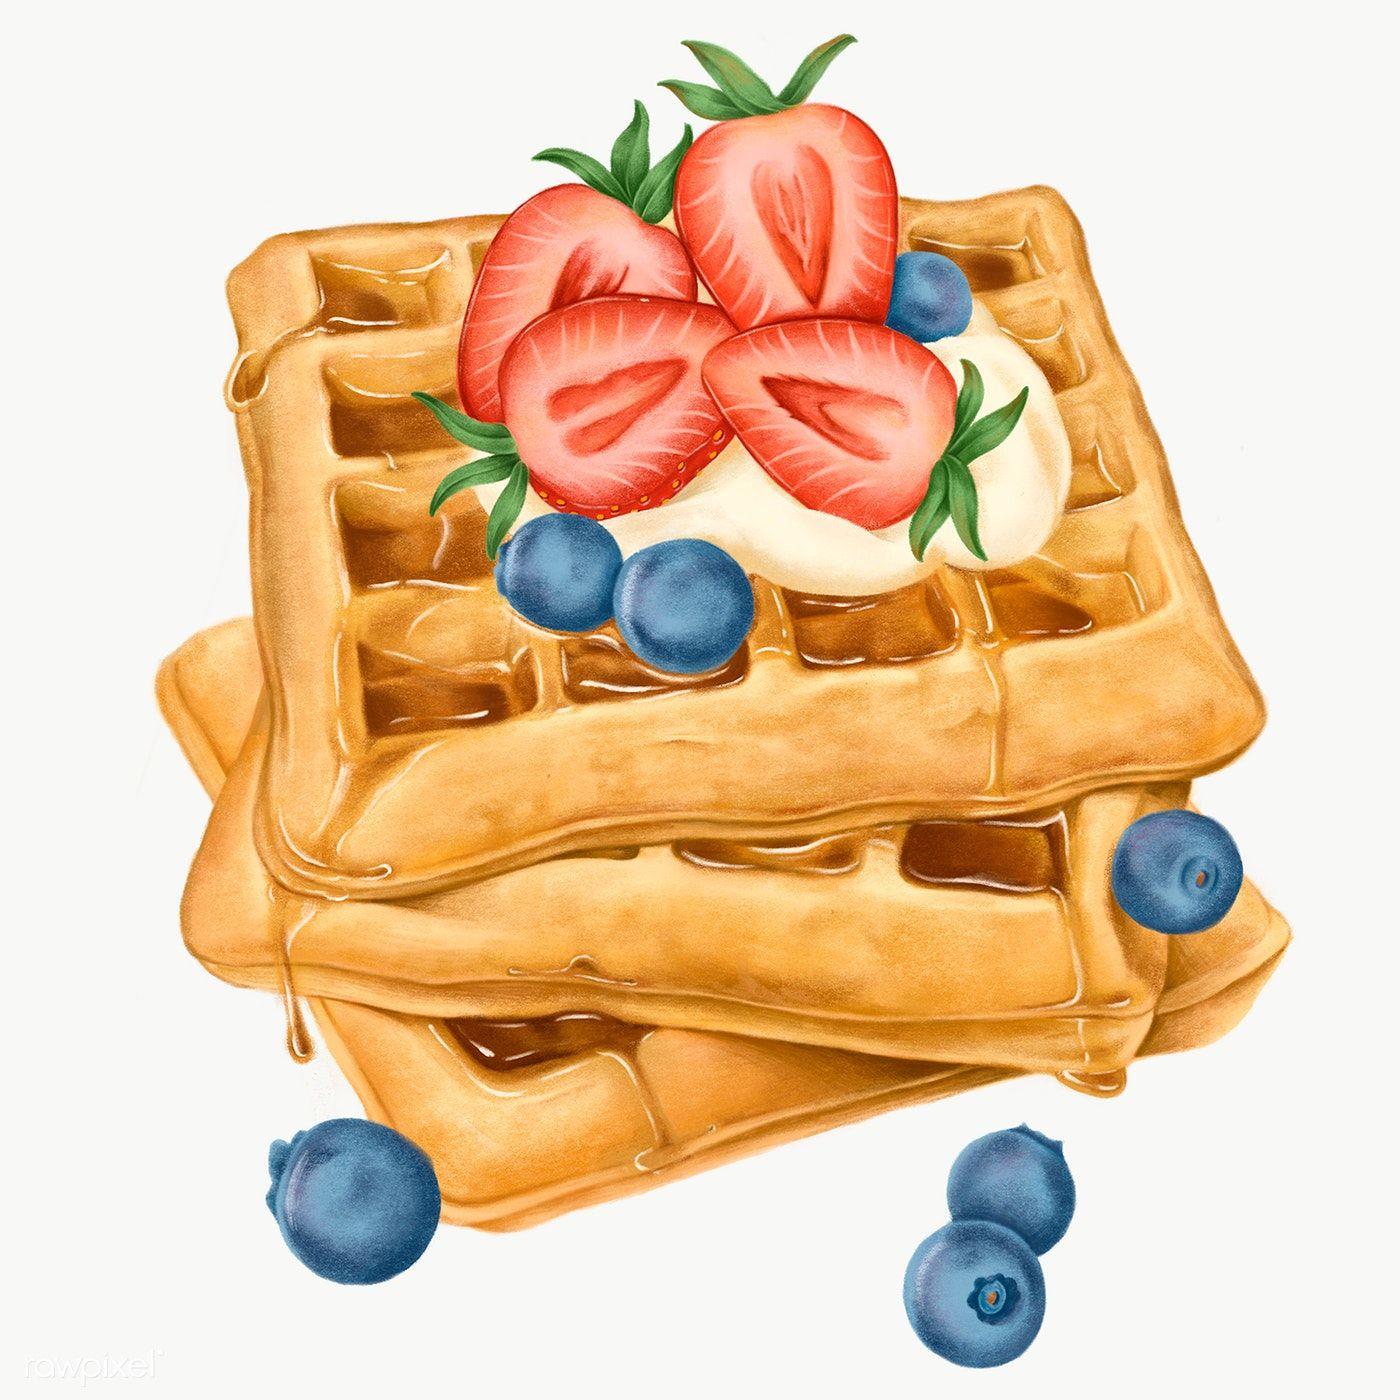 Download free png of Hand drawn sweet waffles tran